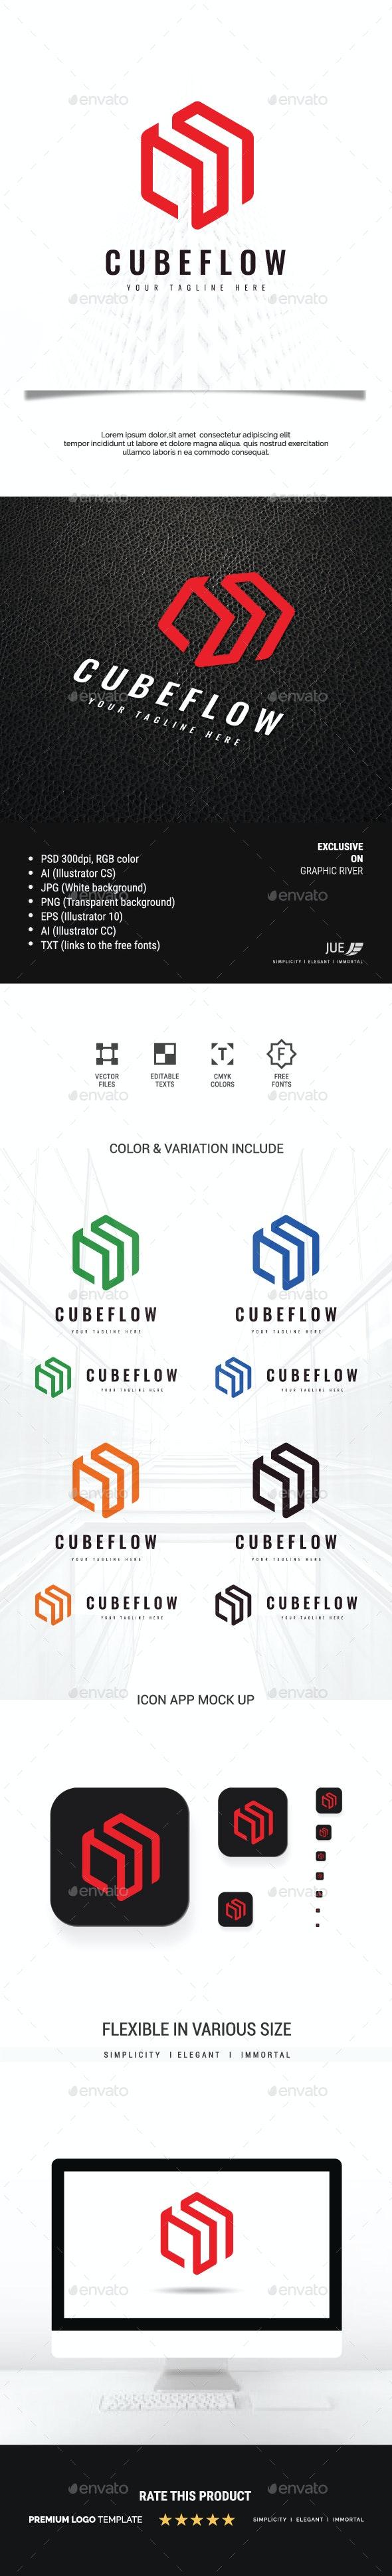 Abstract Cube Flow Logo - Buildings Logo Templates